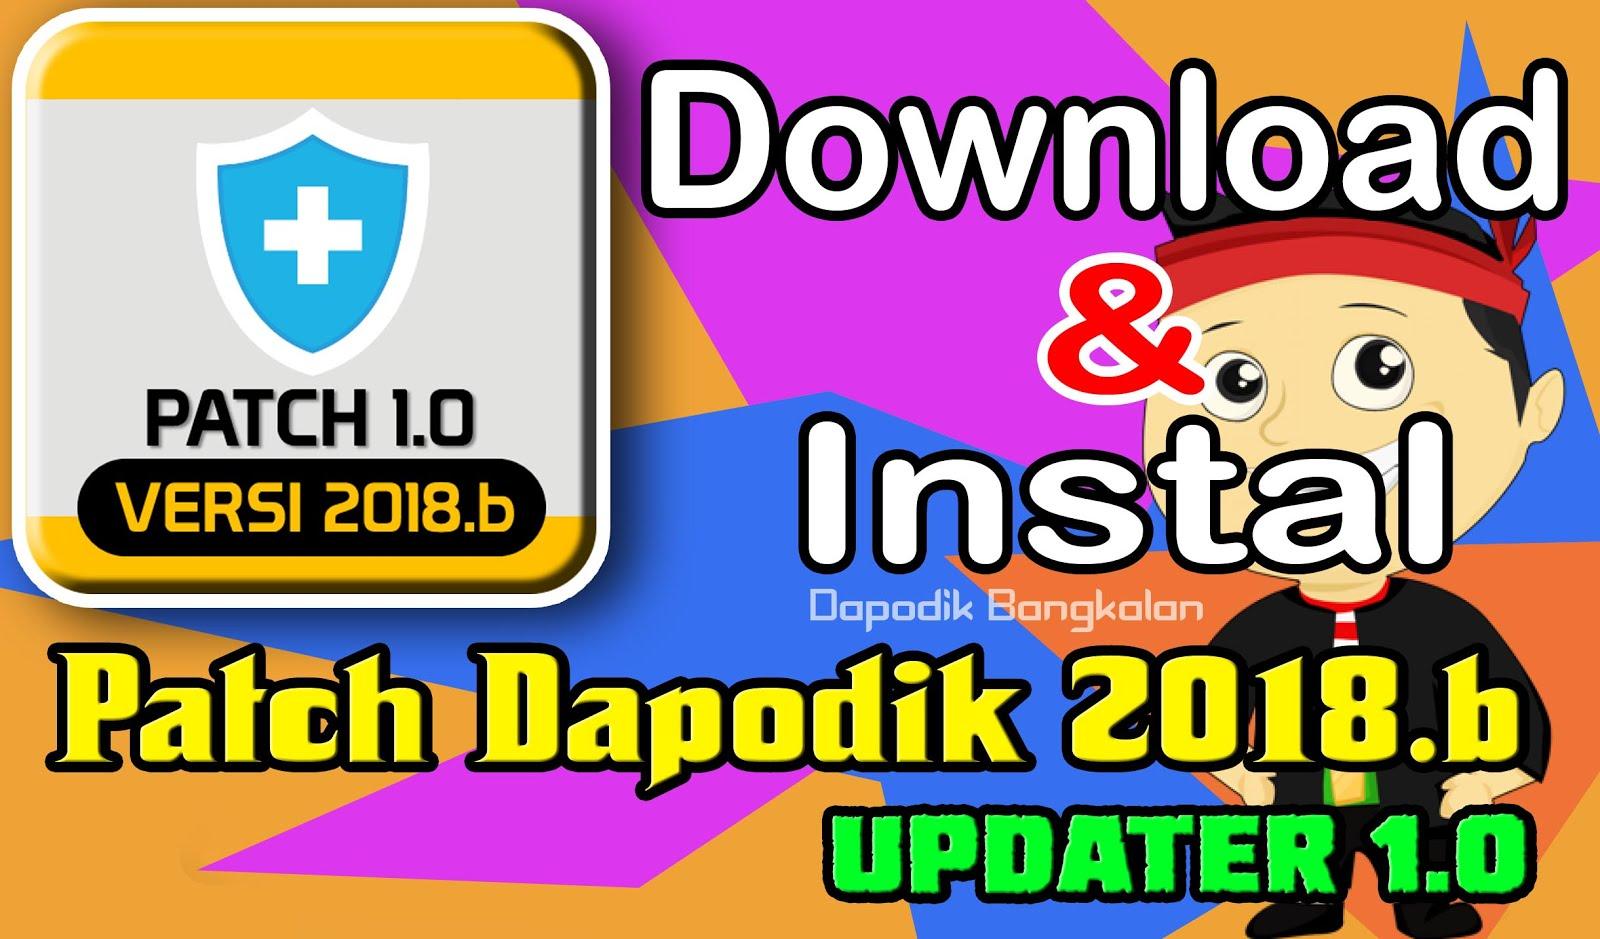 Download Dan Instal Patch Dapodik 2018 B Terbaru Updater Patch 1 0 Dapodikbangkalan Xyz